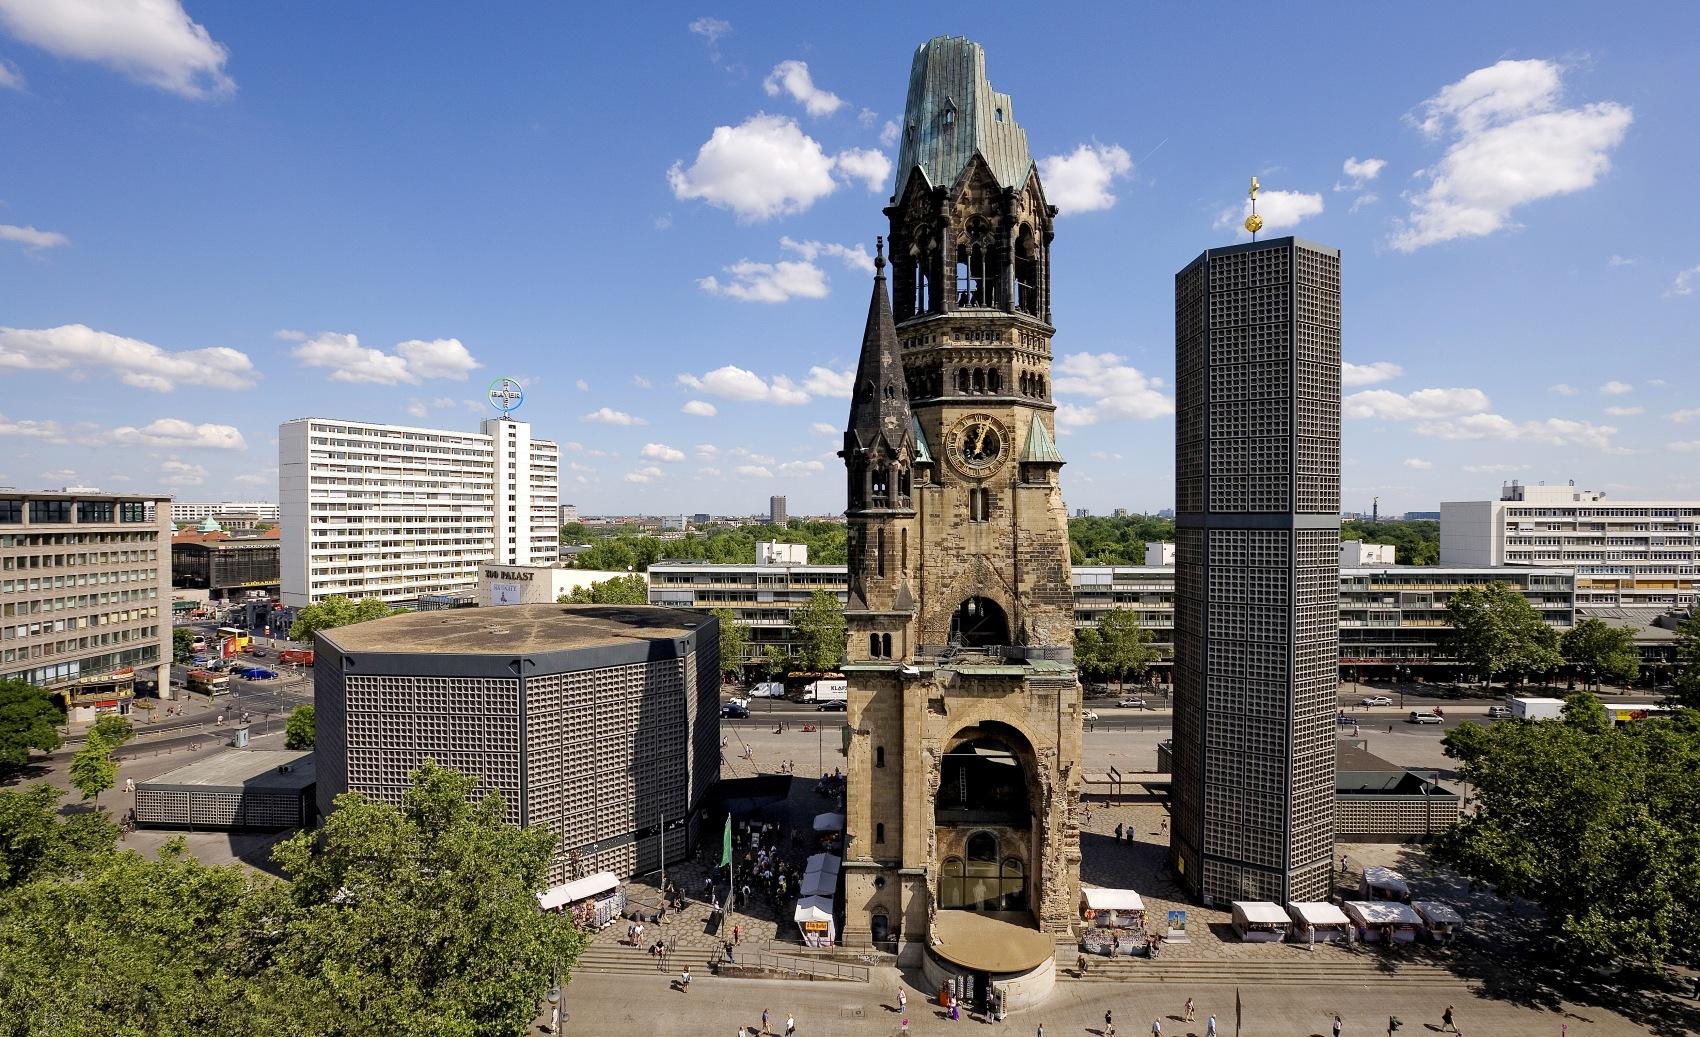 Gedächniskirche am Kudamm in Berlin